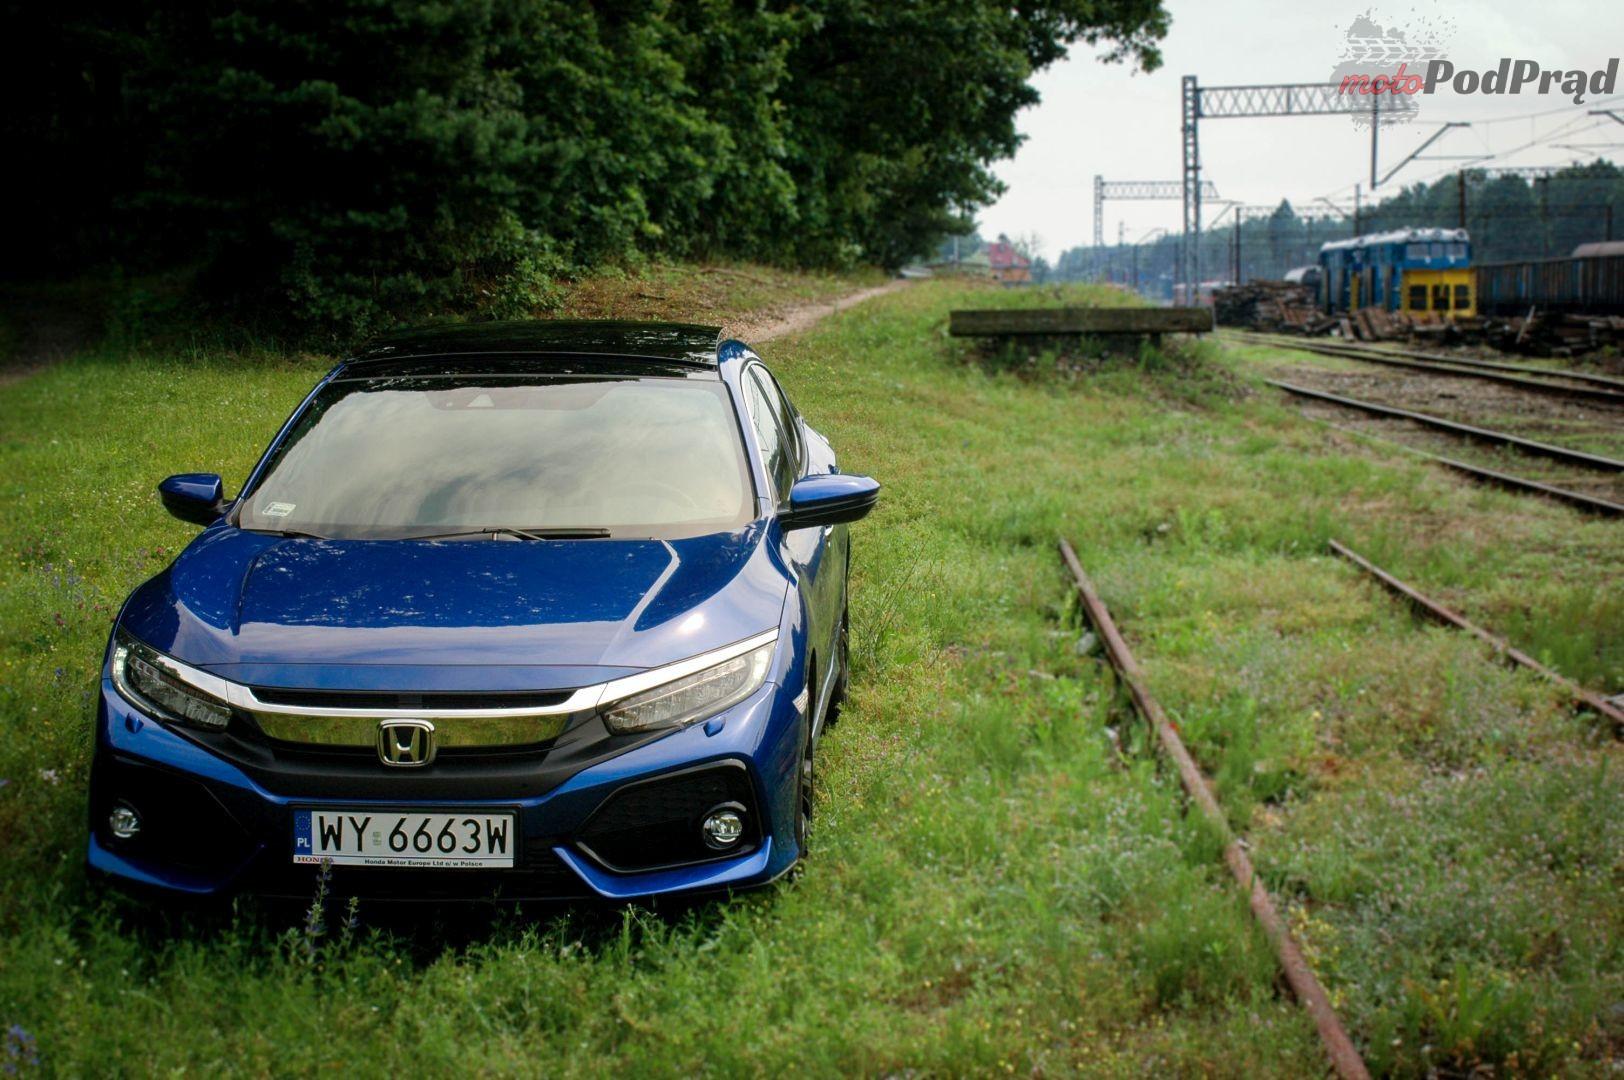 Honda Civic 1 19 Test: Honda Civic X 1.5 VTEC Turbo CVT 5D – stara miłość nie rdzewieje?